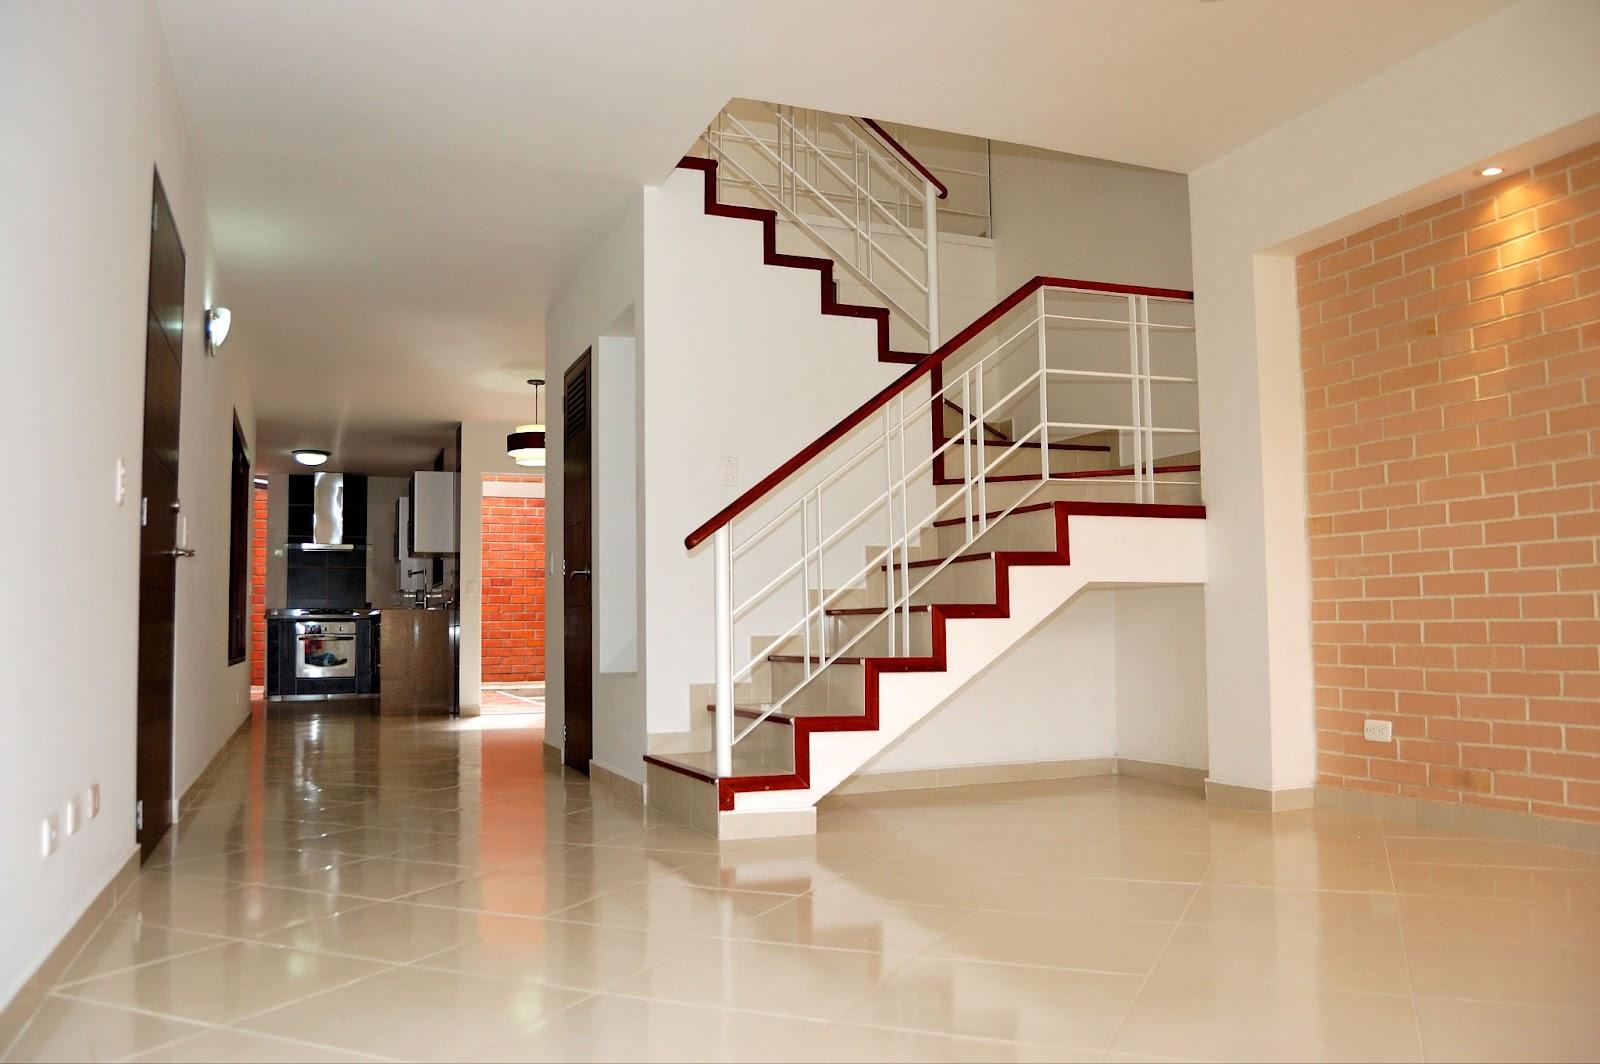 Venta casa palmira casa para estrenar en altamira for Casa muebles palmira